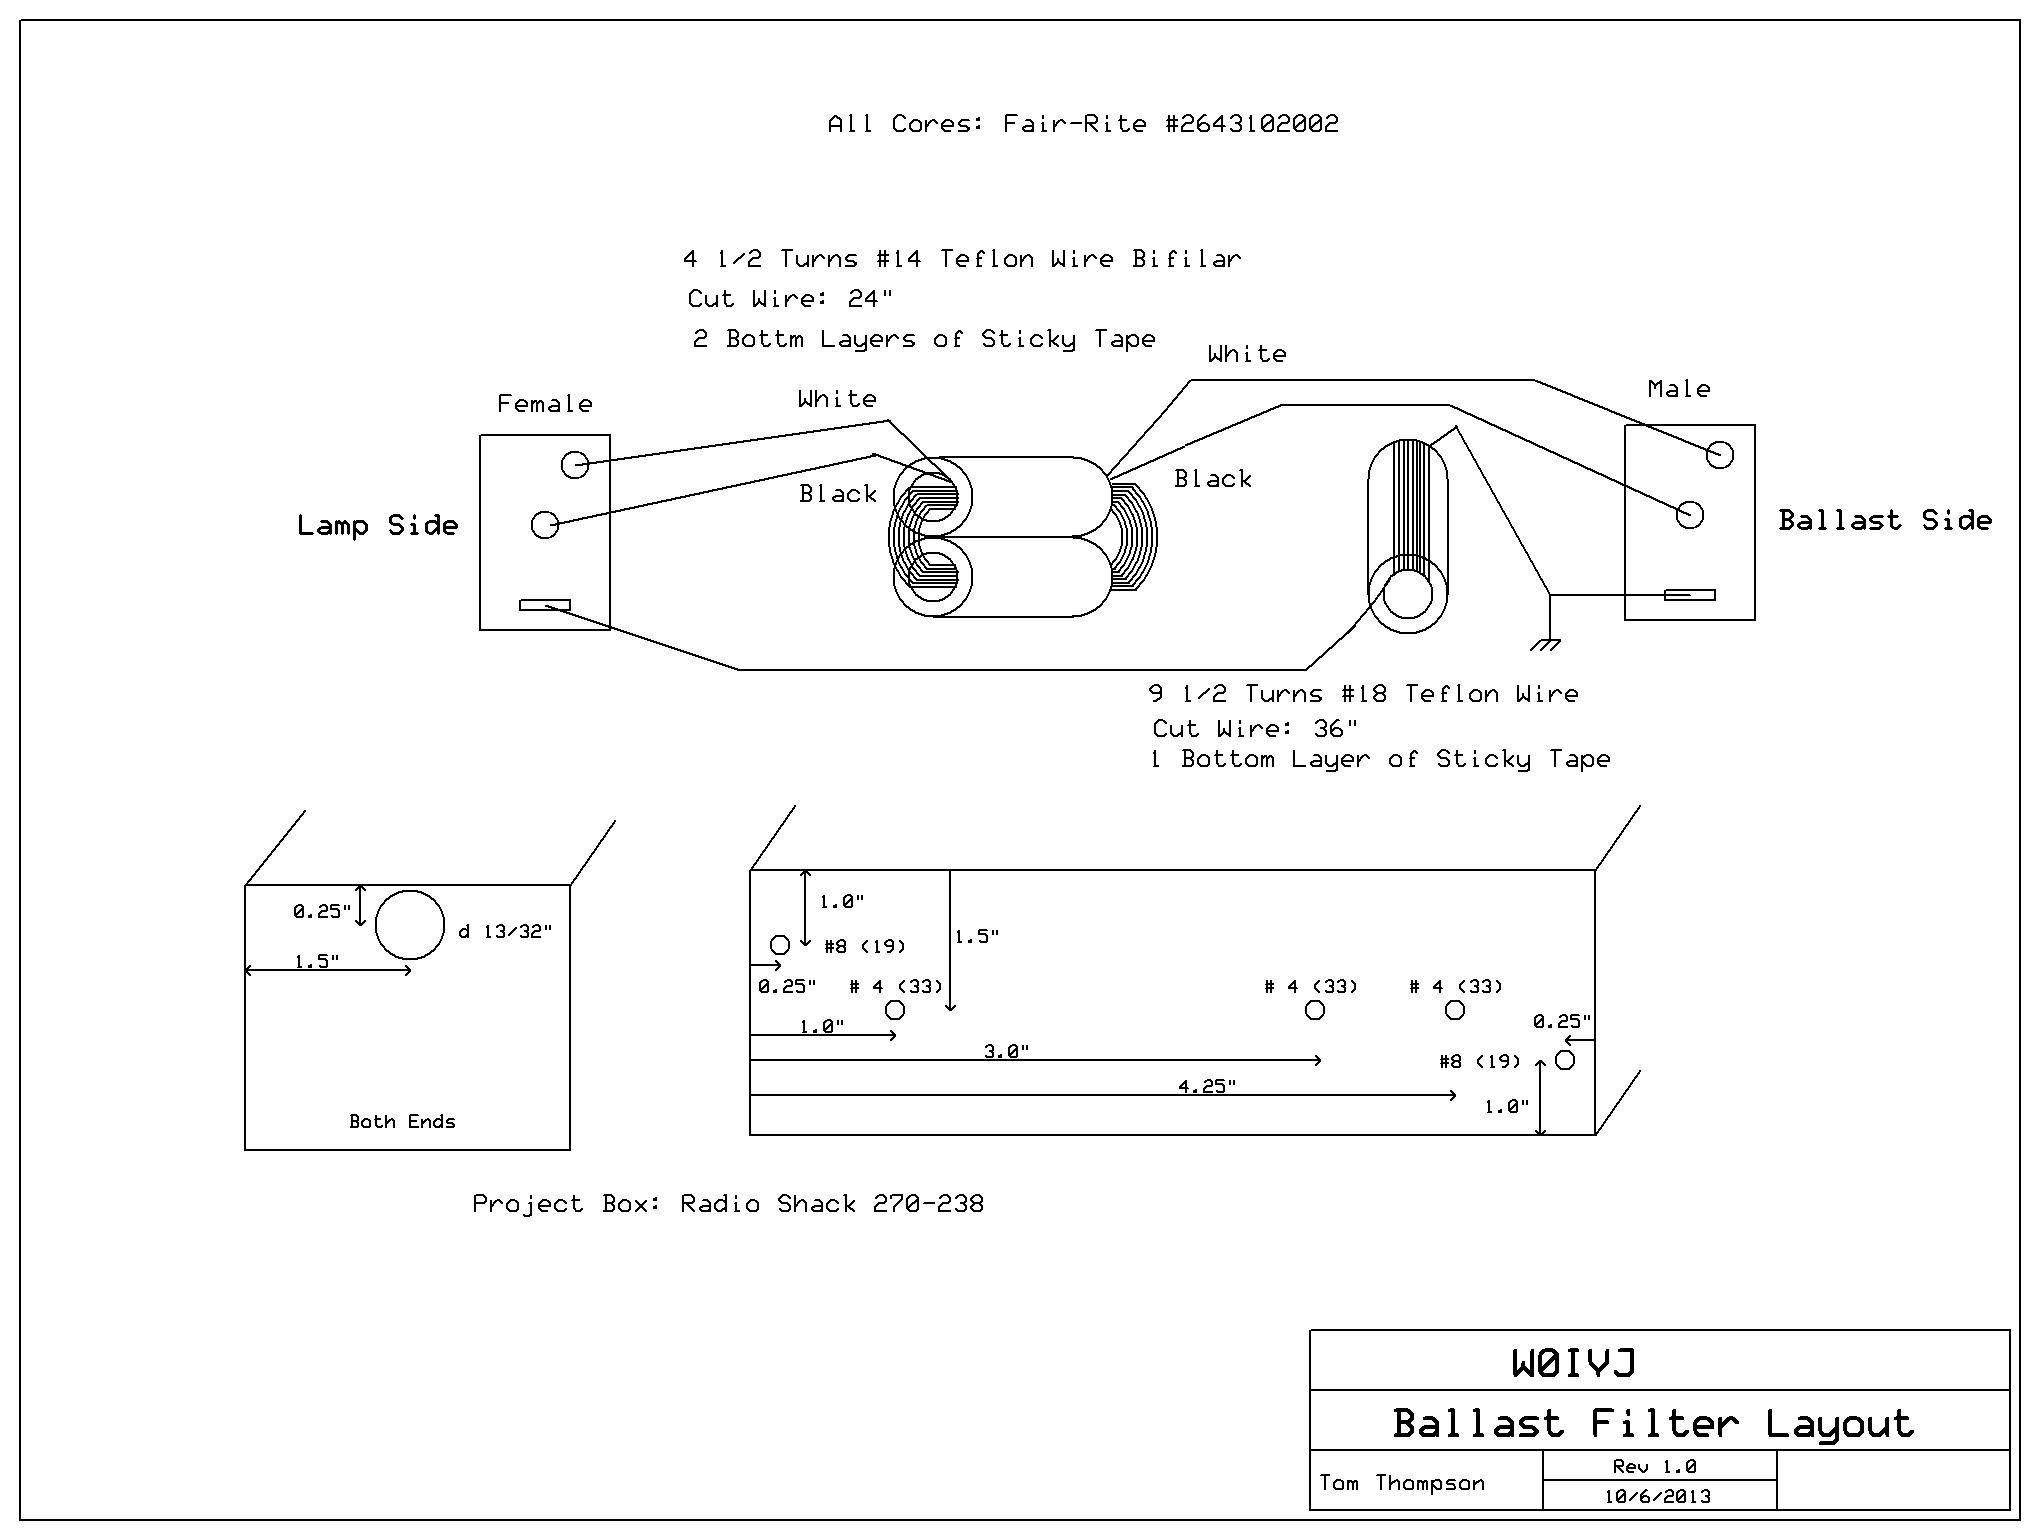 Wiring Metal Halide Ballast Diagram 35 Images Moreover Philips Advance Sodium Shrutiradio Filter Layoutresize6652c502